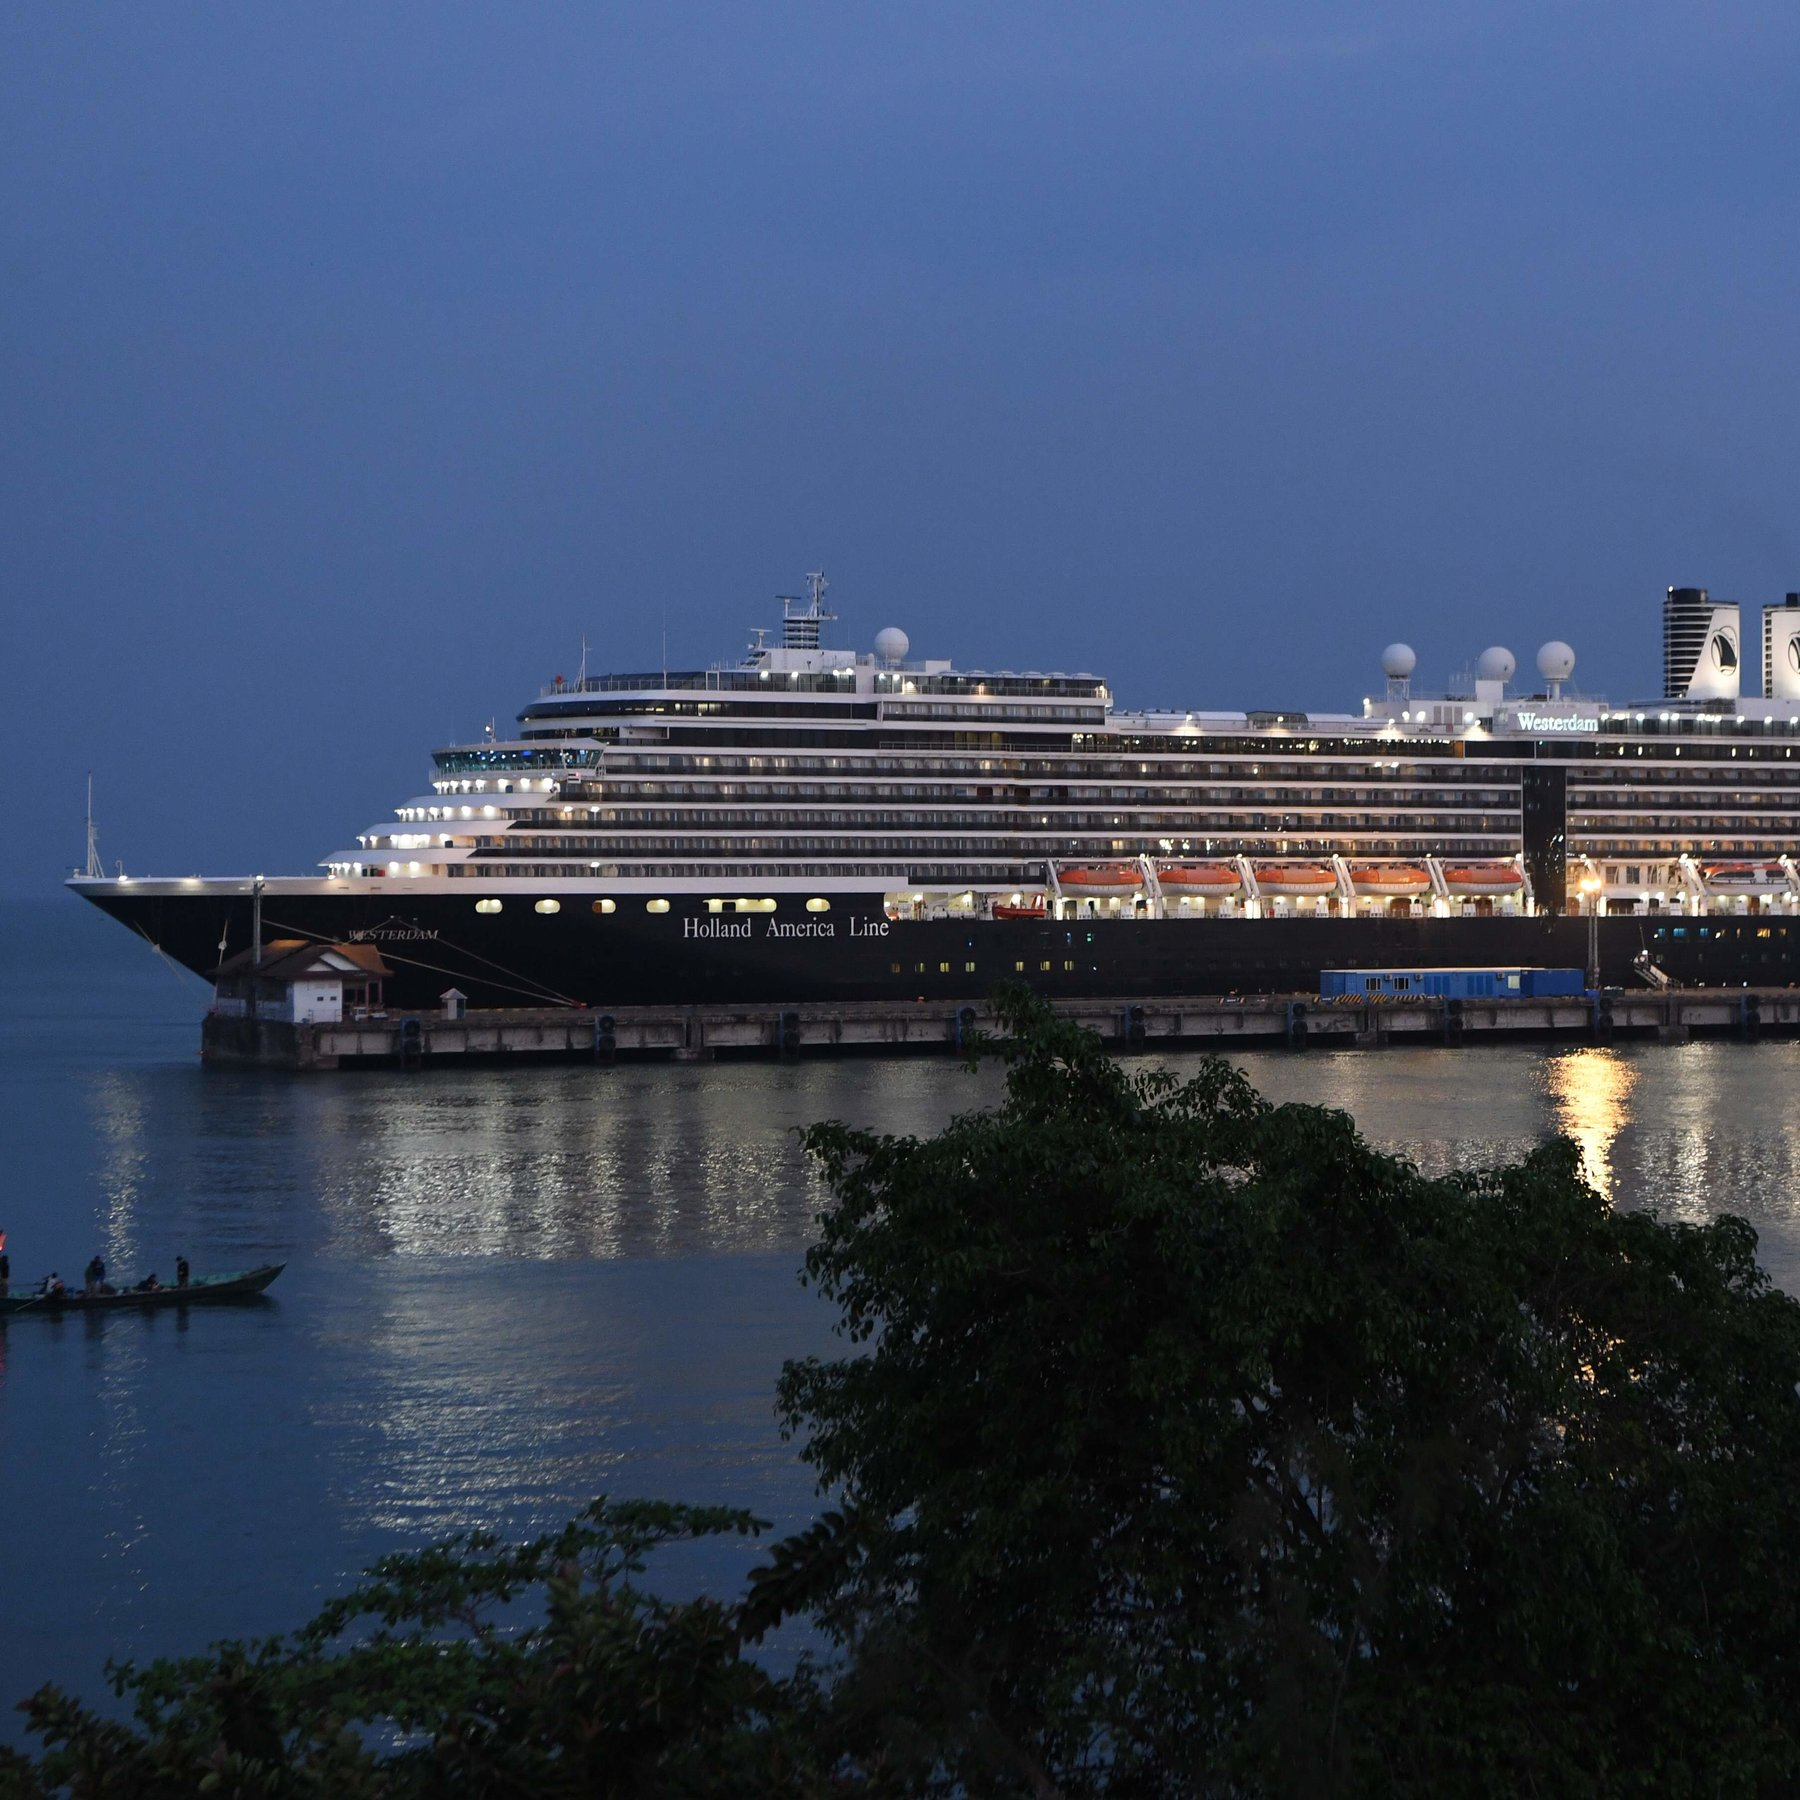 Cruise Giant Carnival Works to Manage Deepening Coronavirus Crisis ...